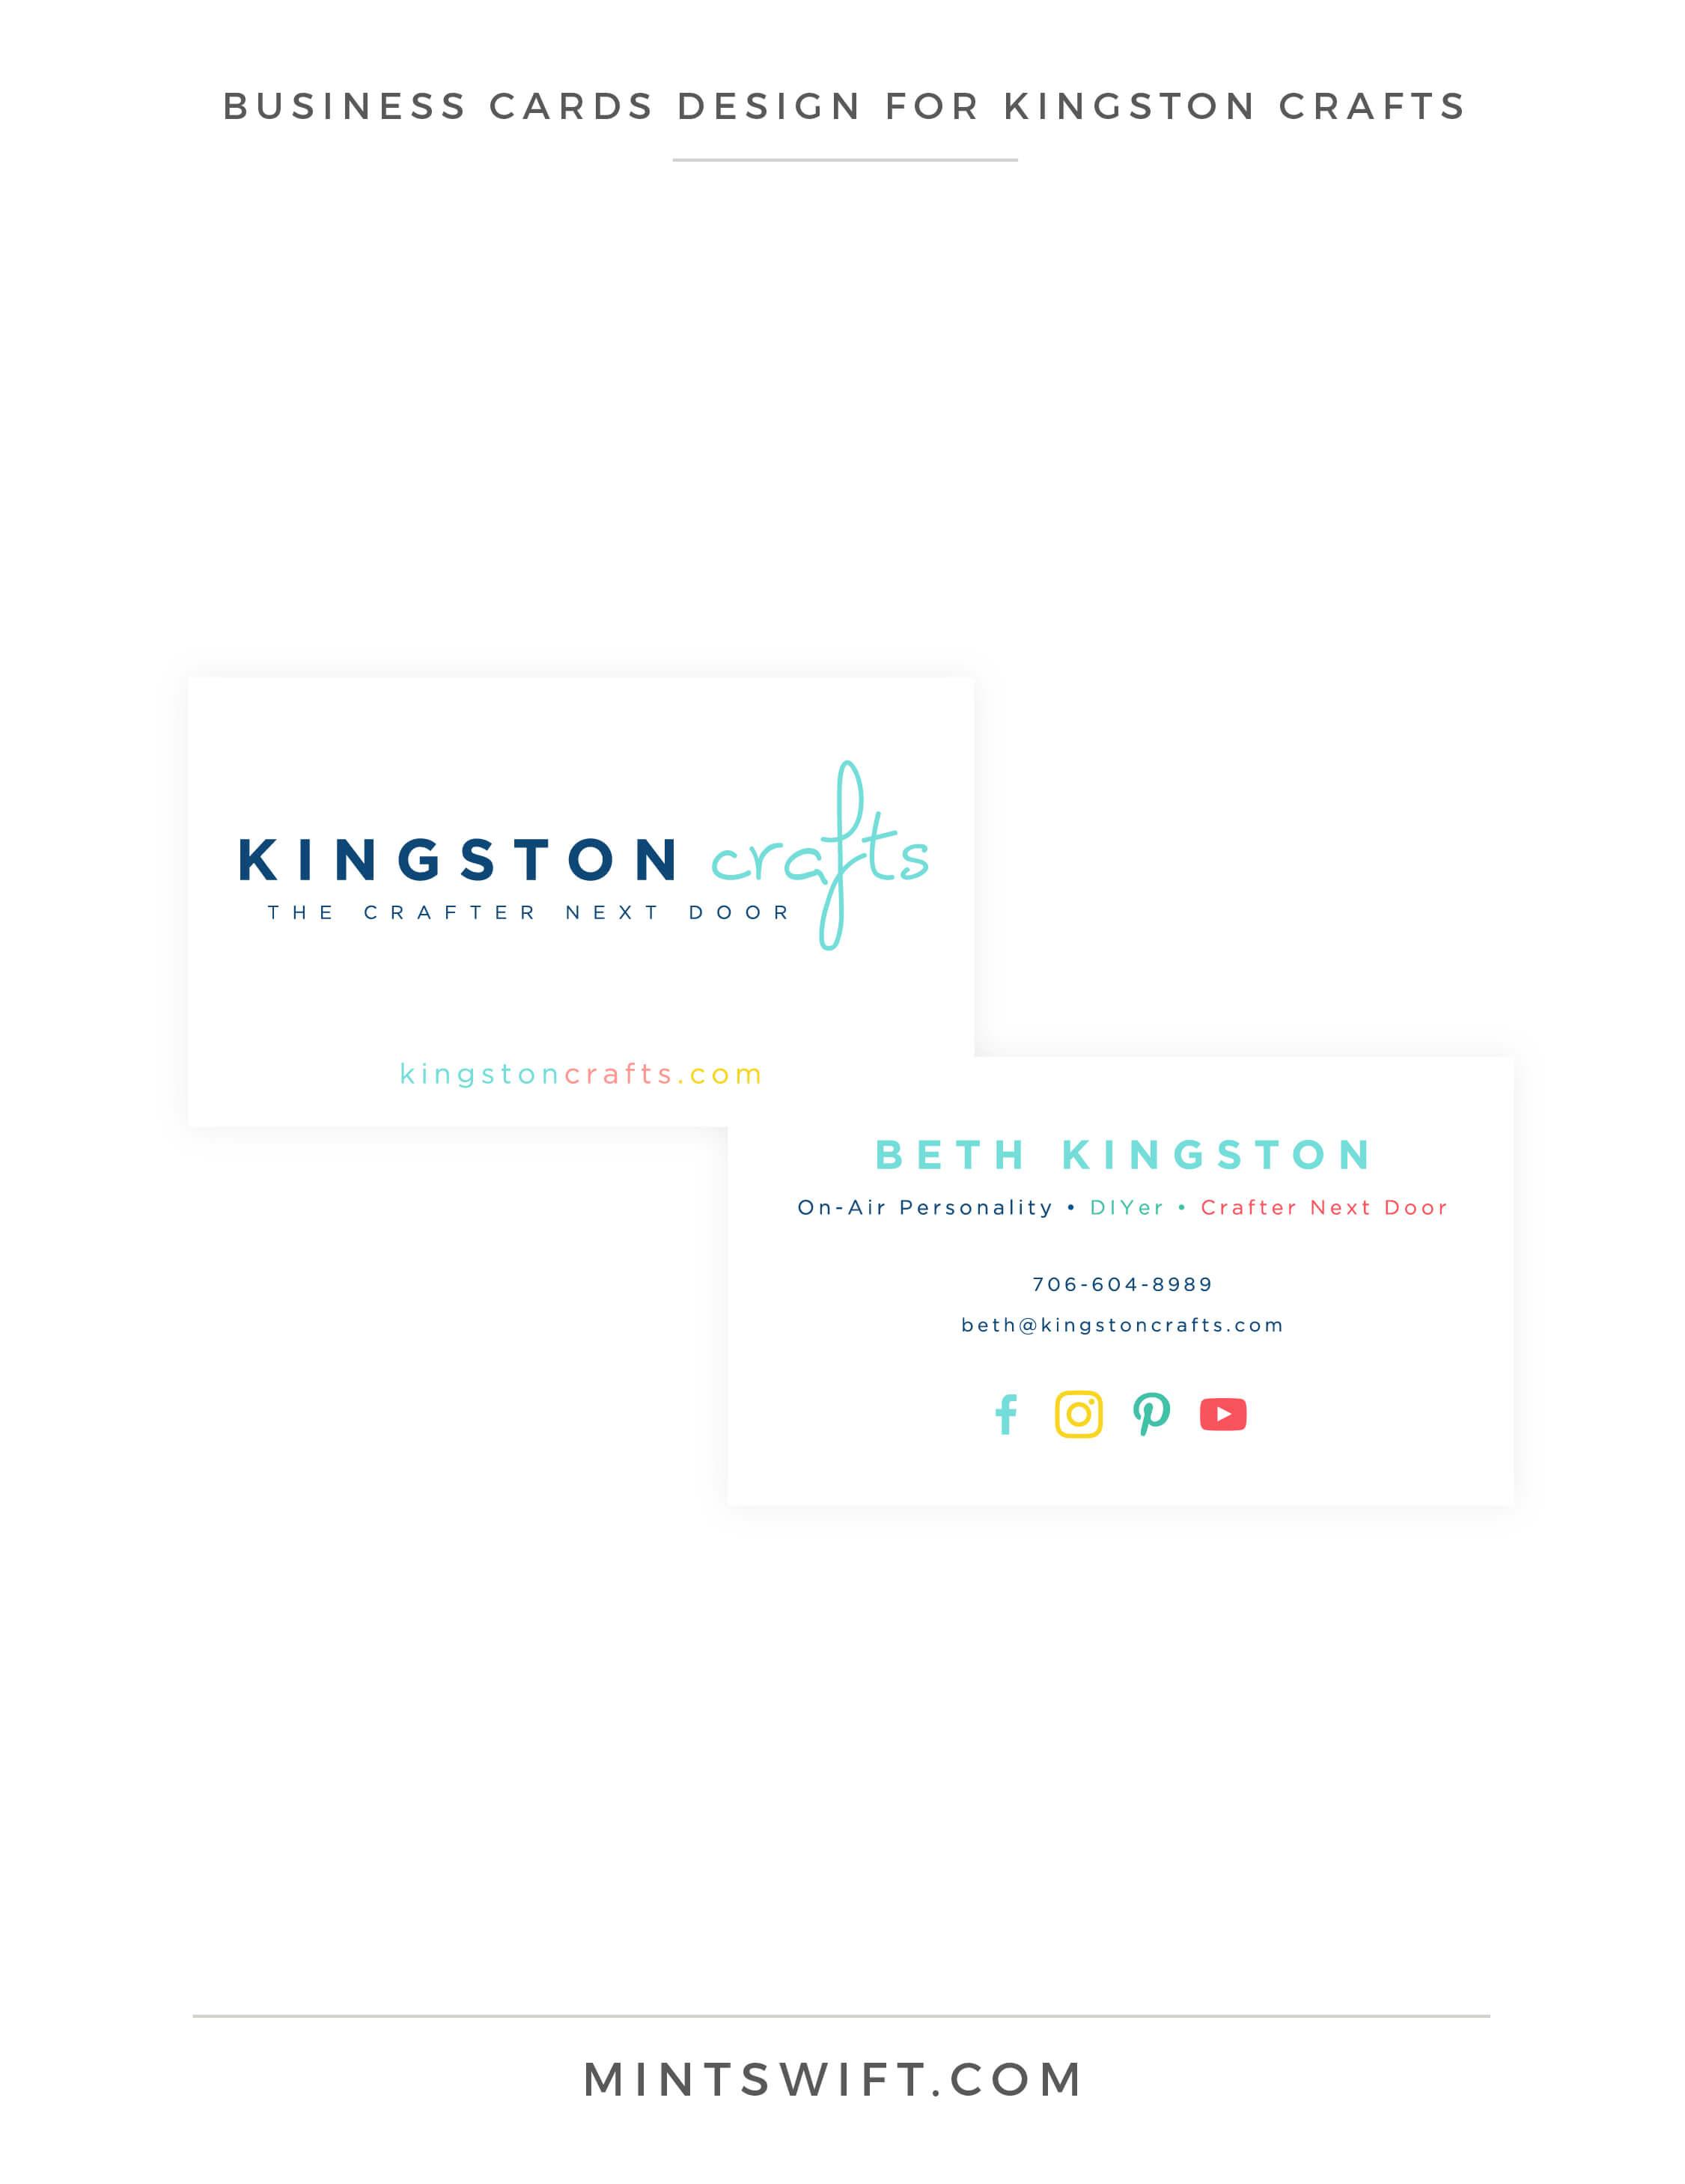 Kingston Crafts - Business Cards Design - Brand Design Package - MintSwift